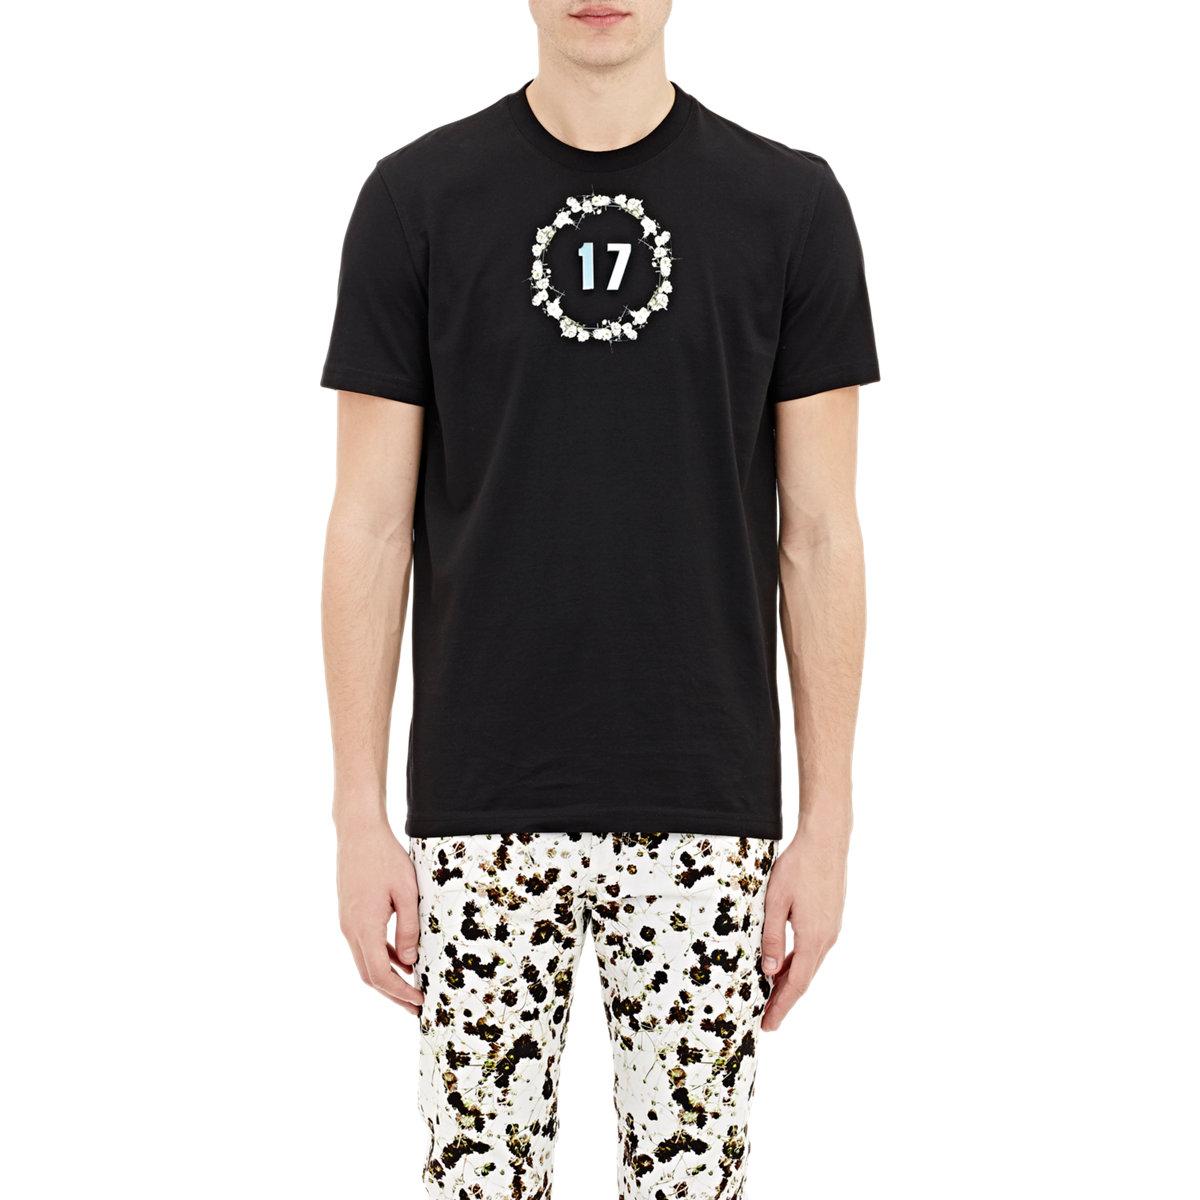 lyst givenchy cotton 39 17 t shirt in black for men. Black Bedroom Furniture Sets. Home Design Ideas